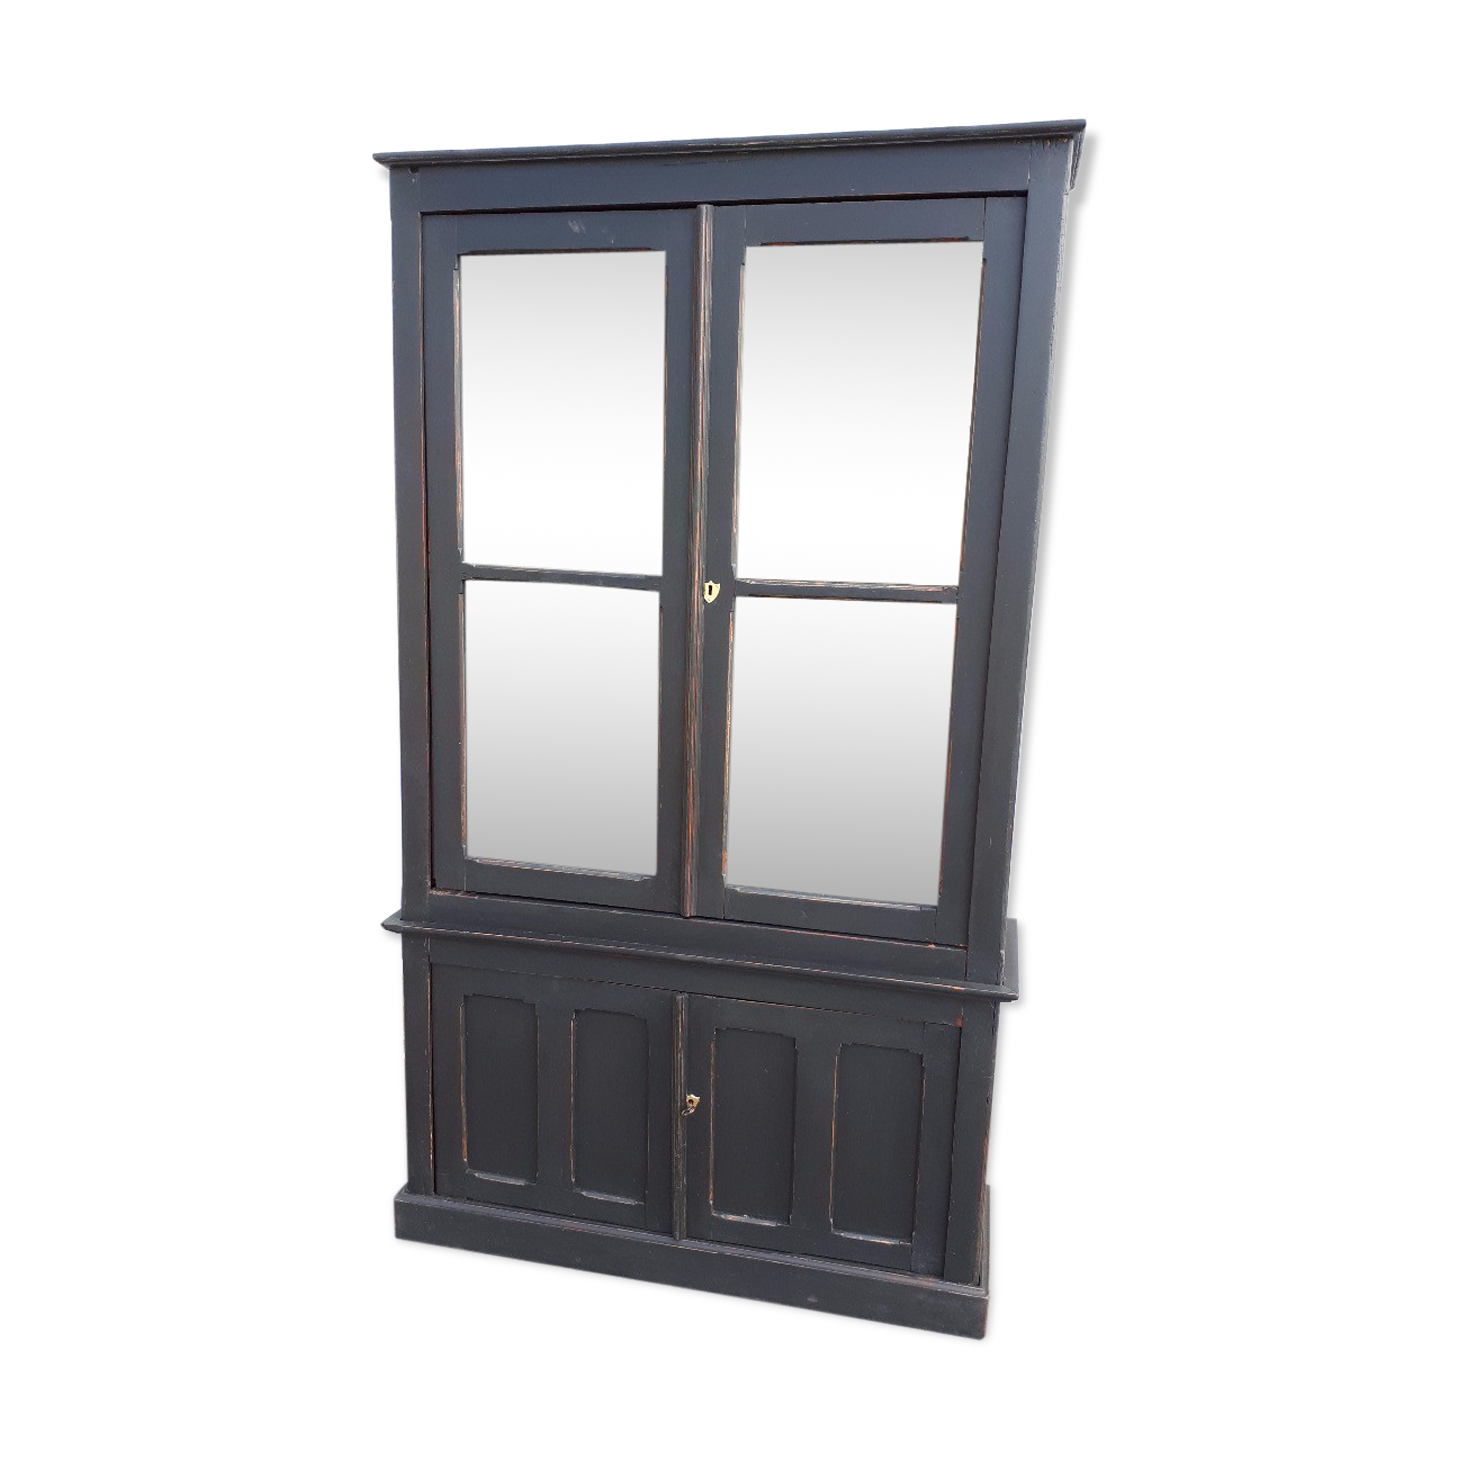 Vitrine meuble great vitrine scandinave bois with vitrine - Patine noire meuble ...